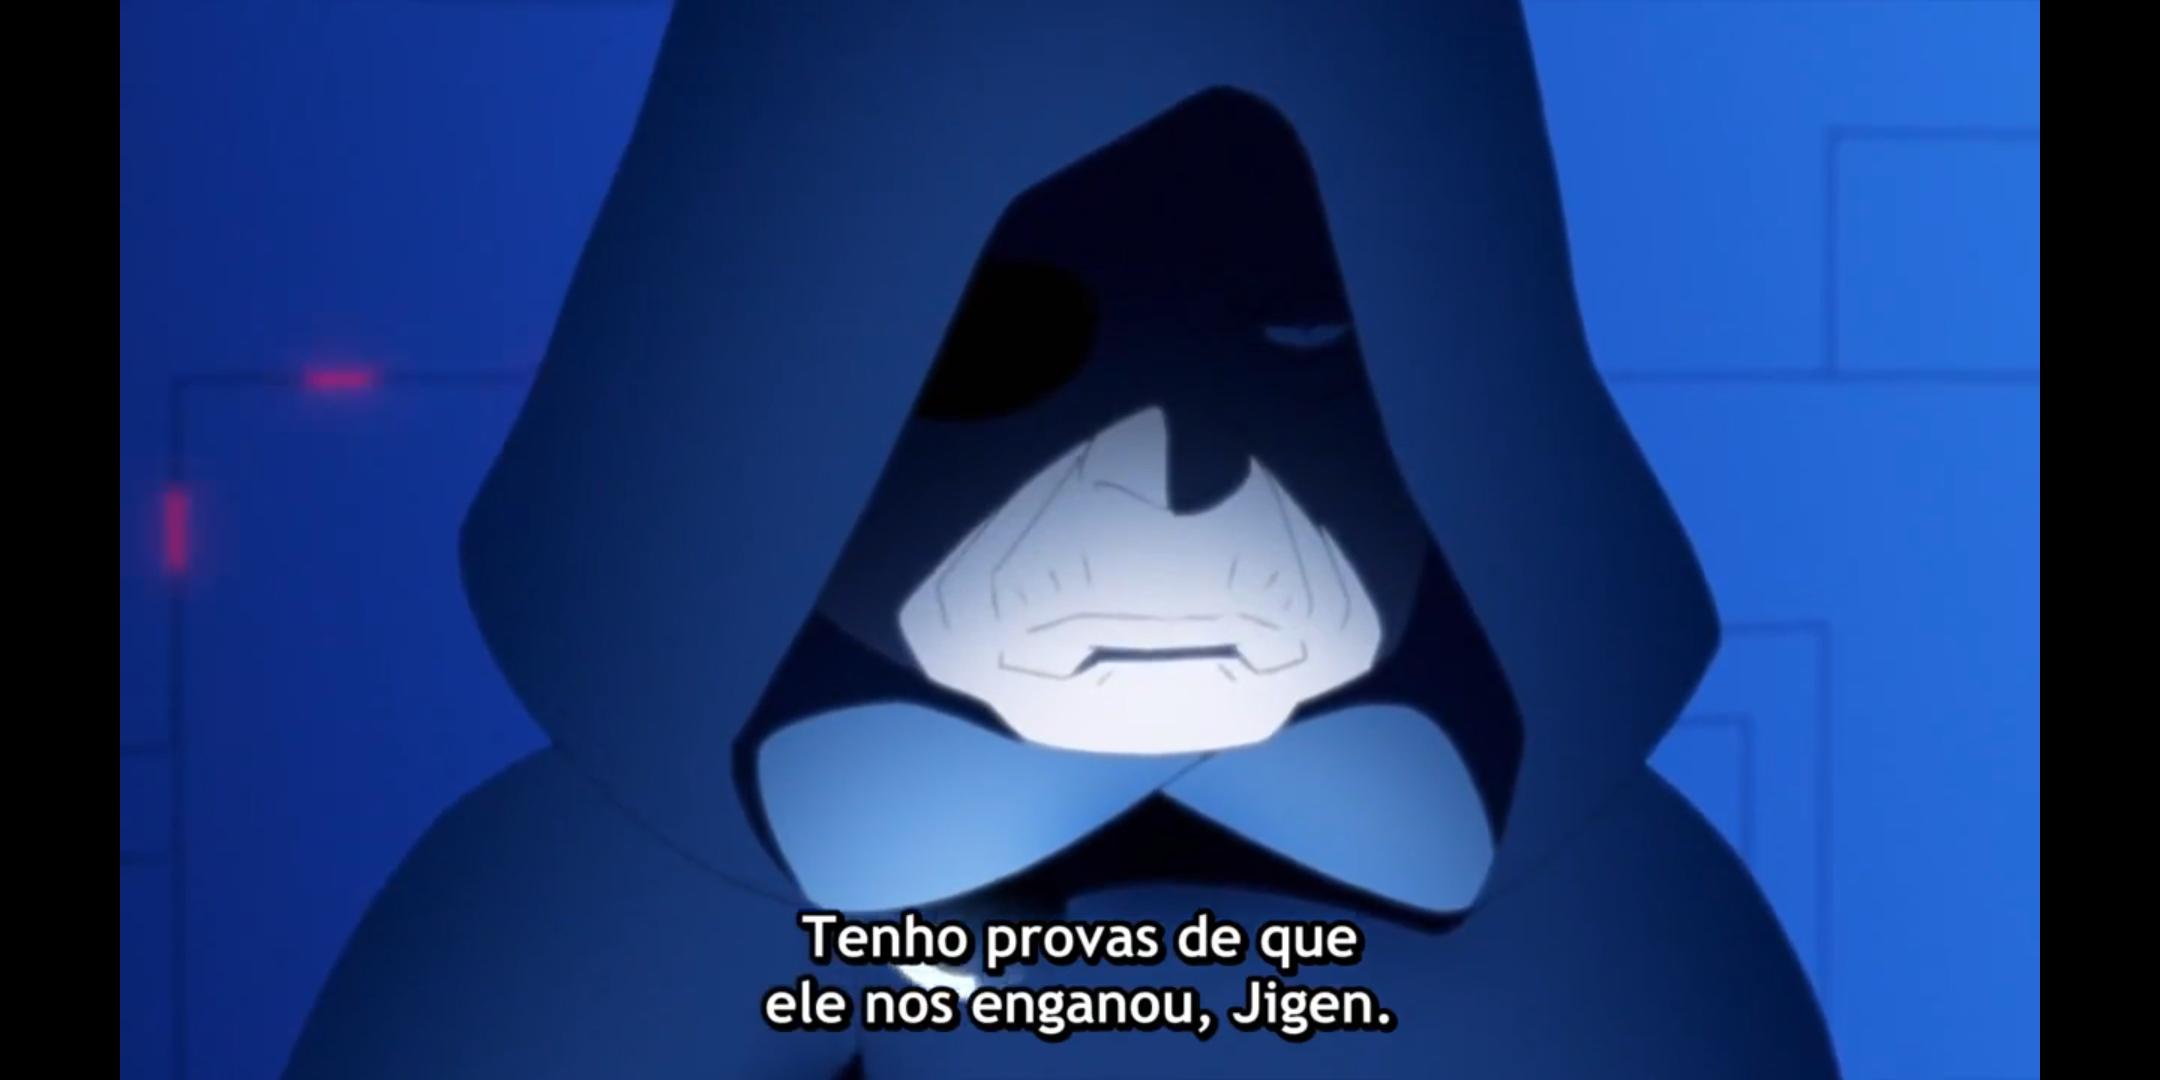 Episódio 176 de Boruto - Victor conversa com Jigen